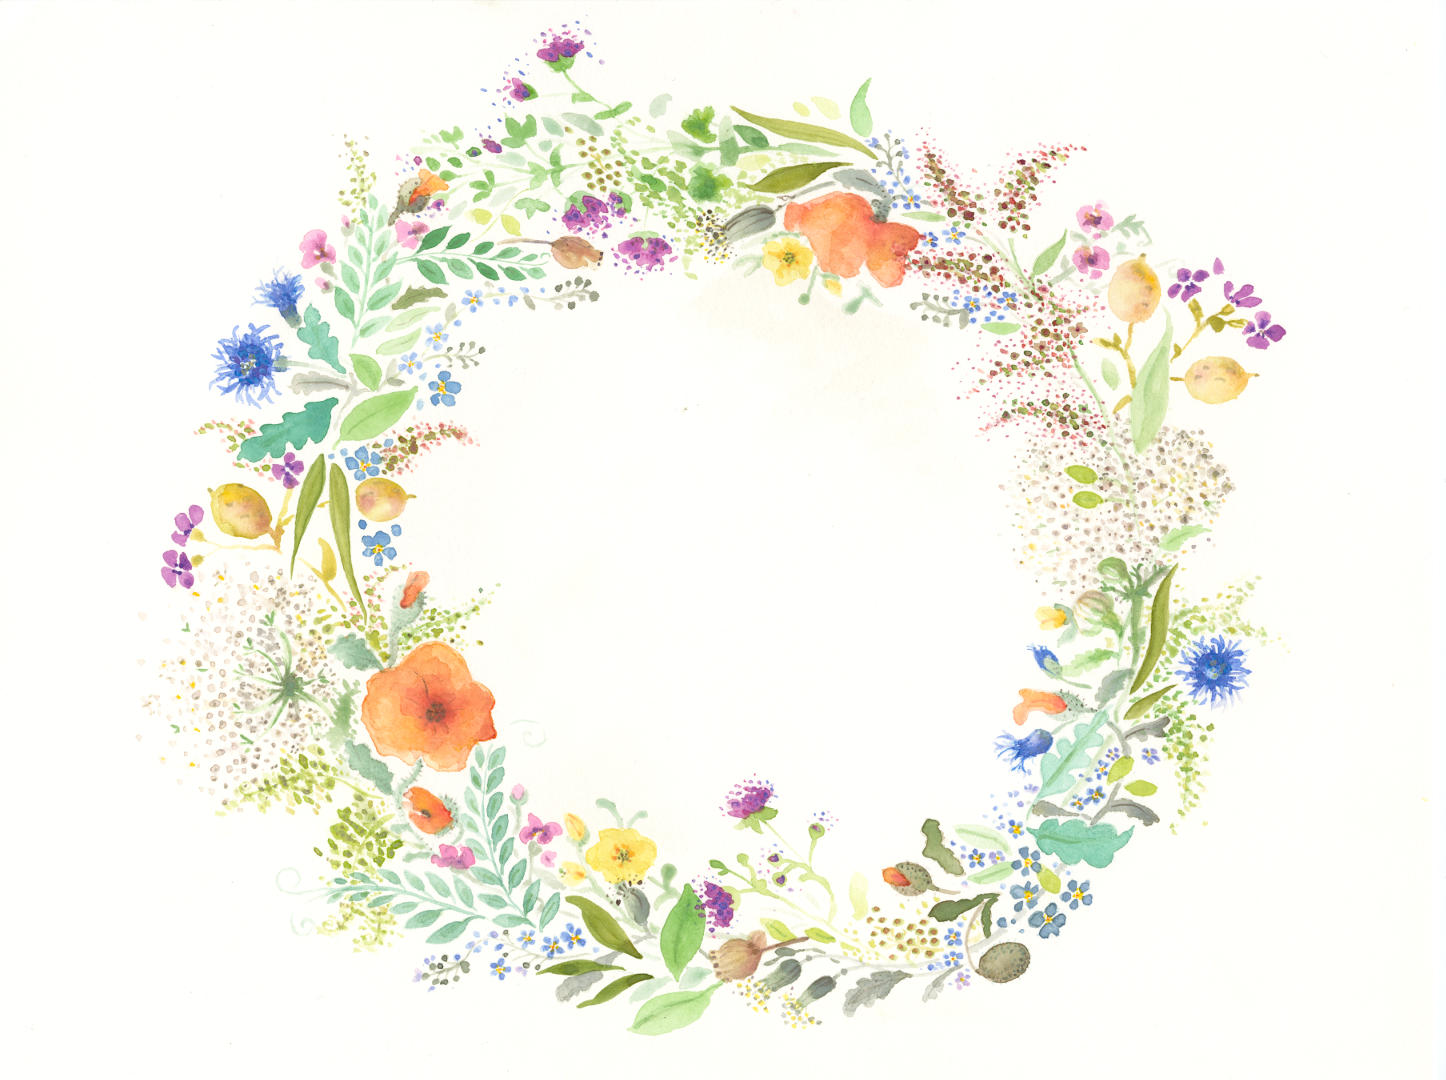 Wild Flowers_1_1800.jpg